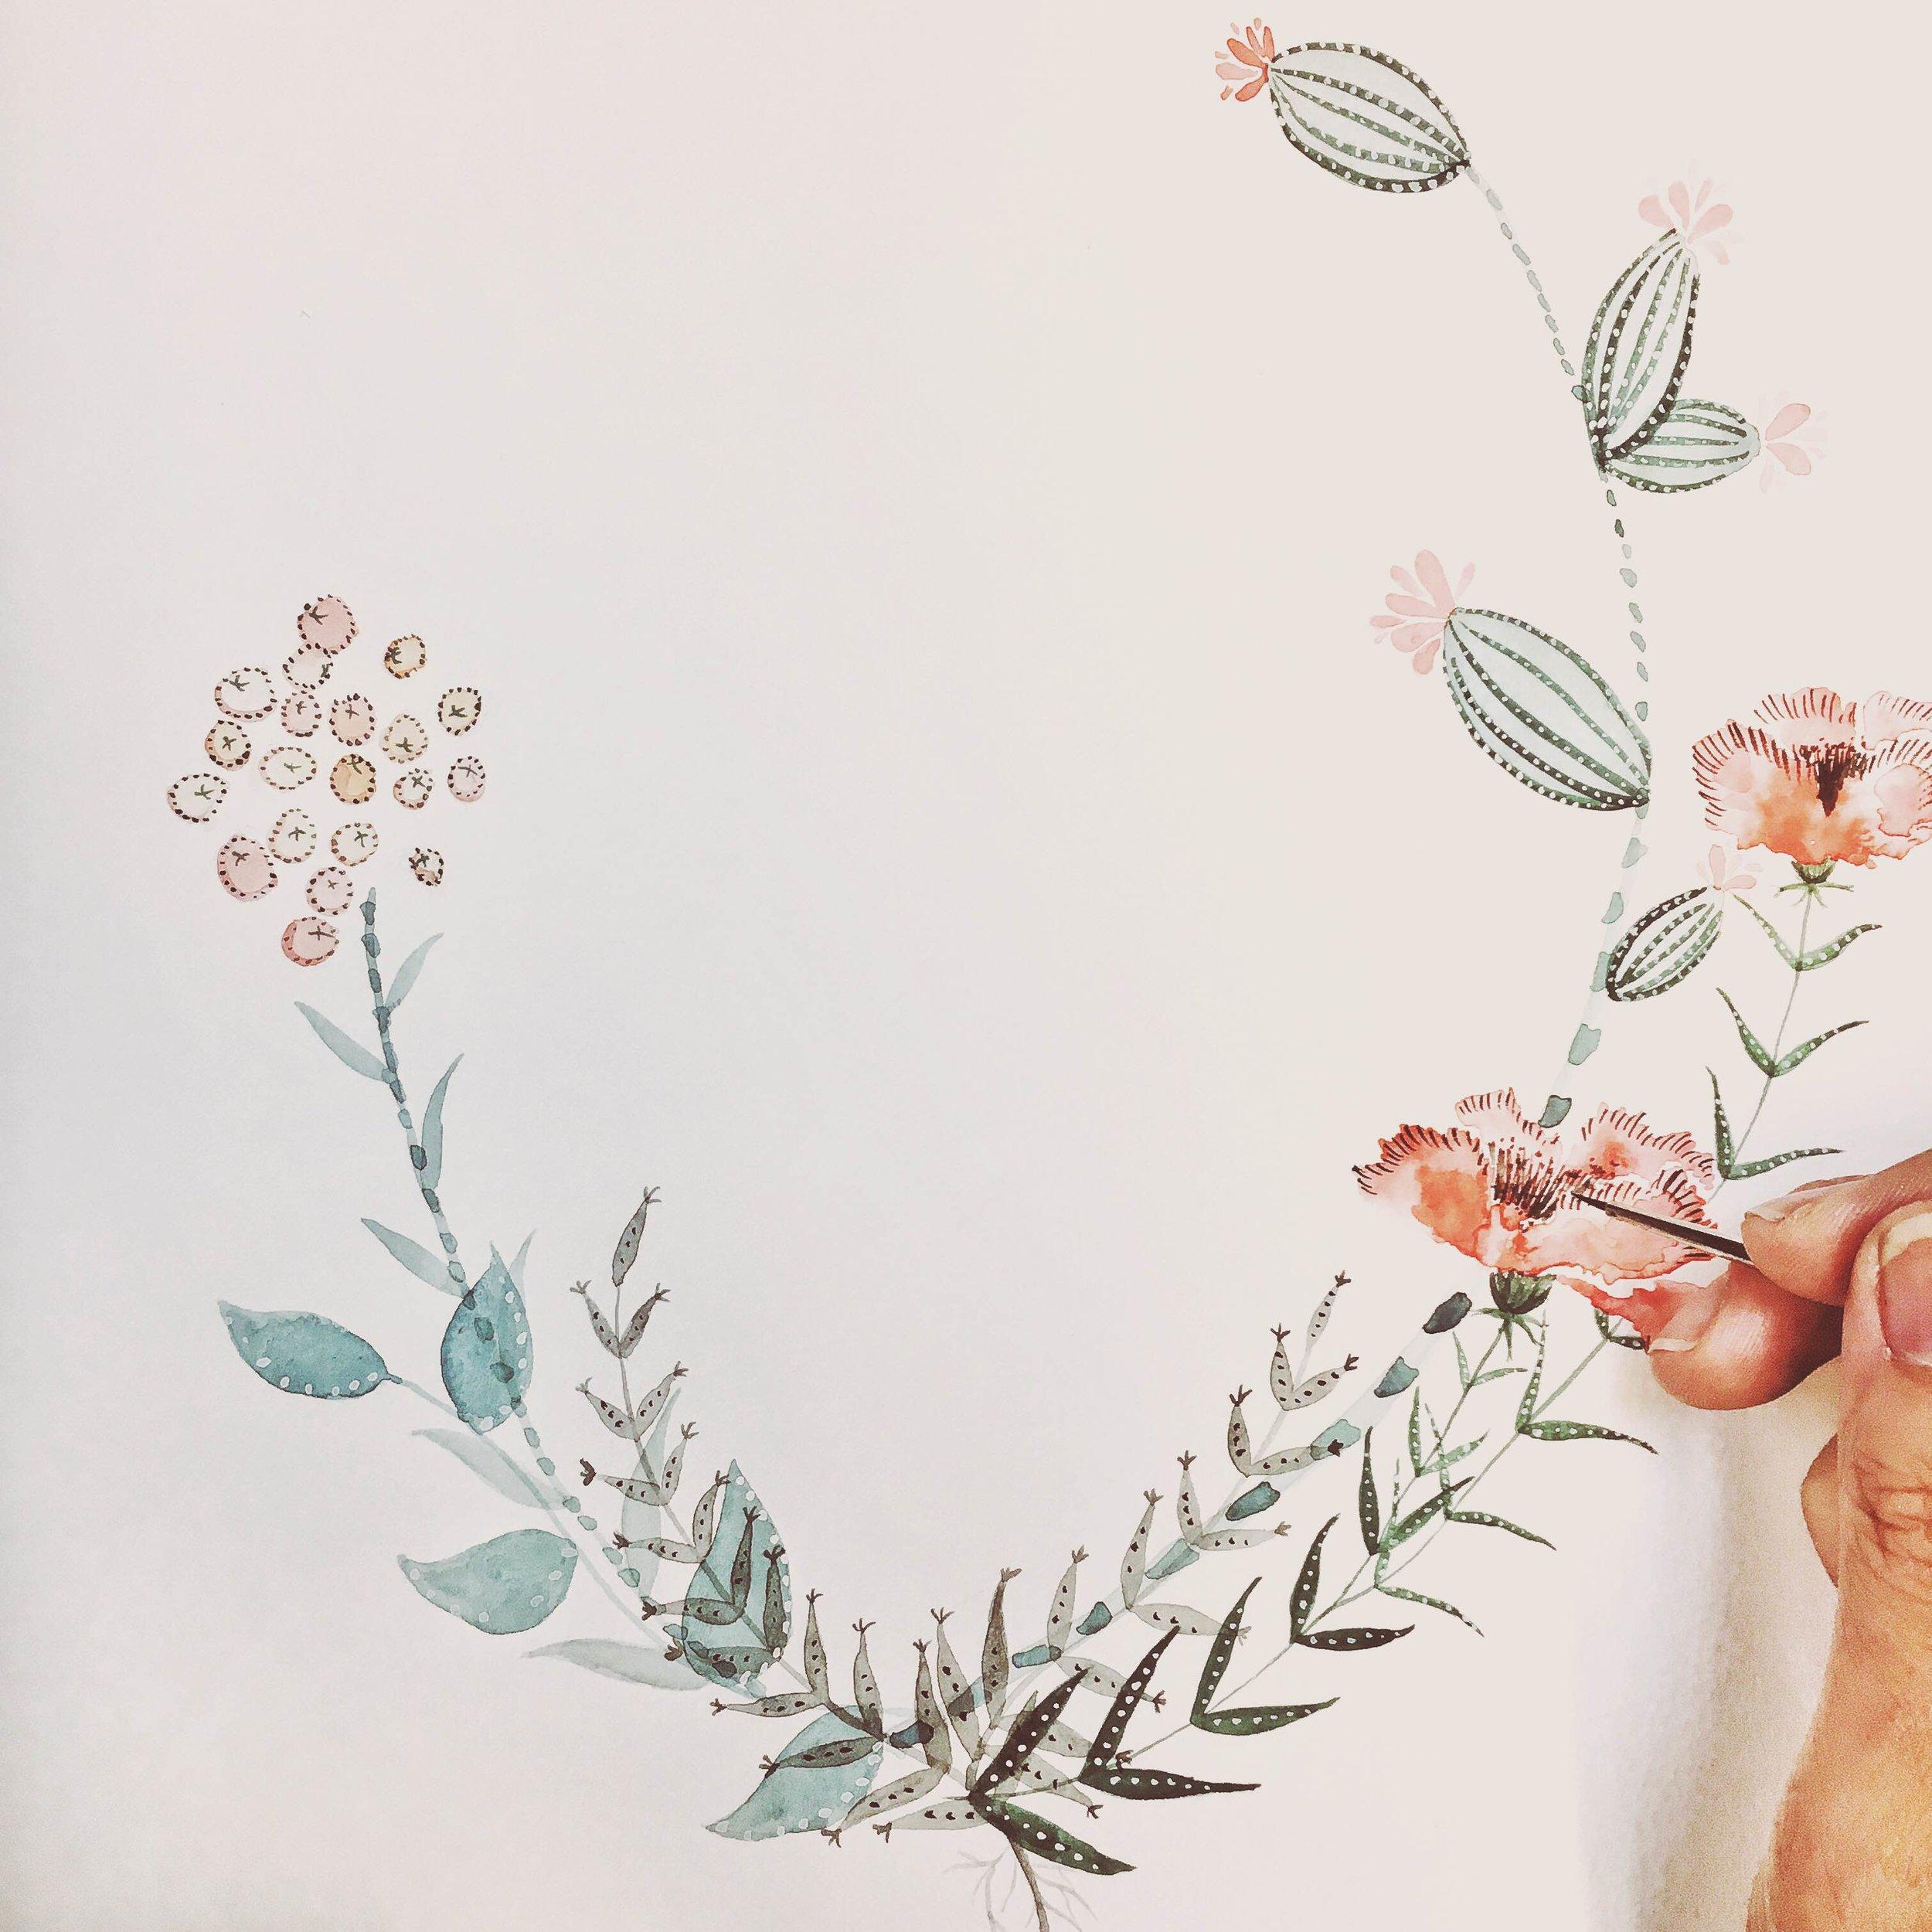 winter wreath sketch.JPG